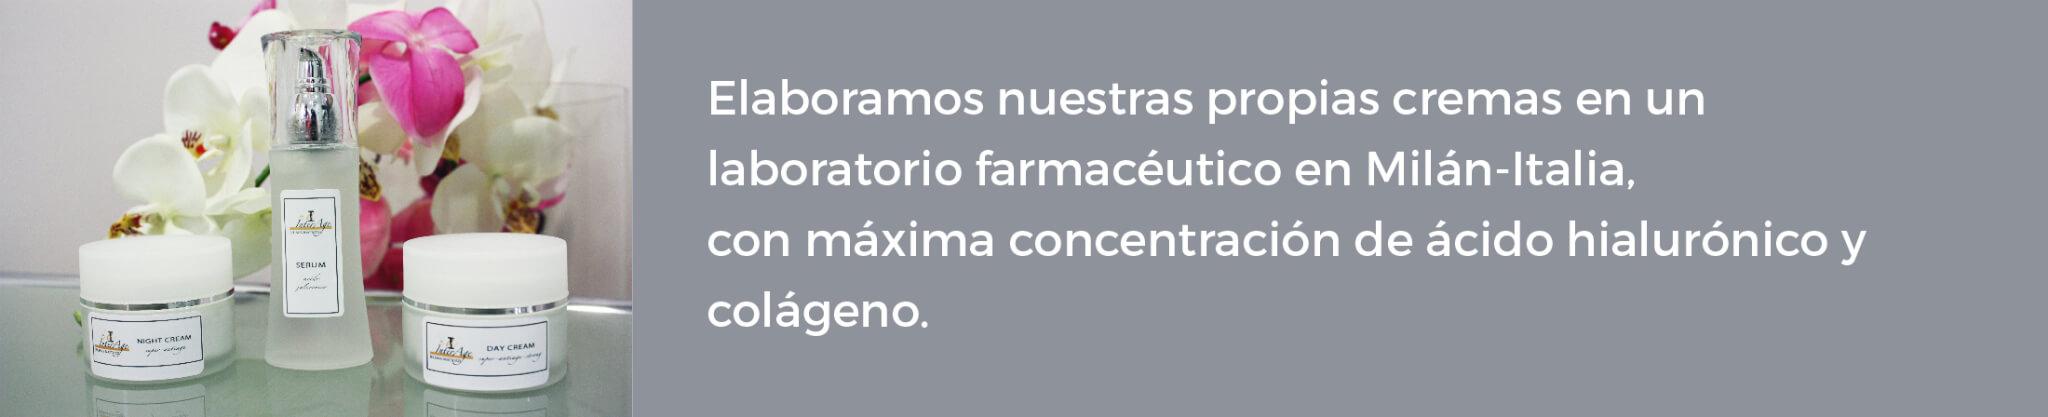 cremas3-10